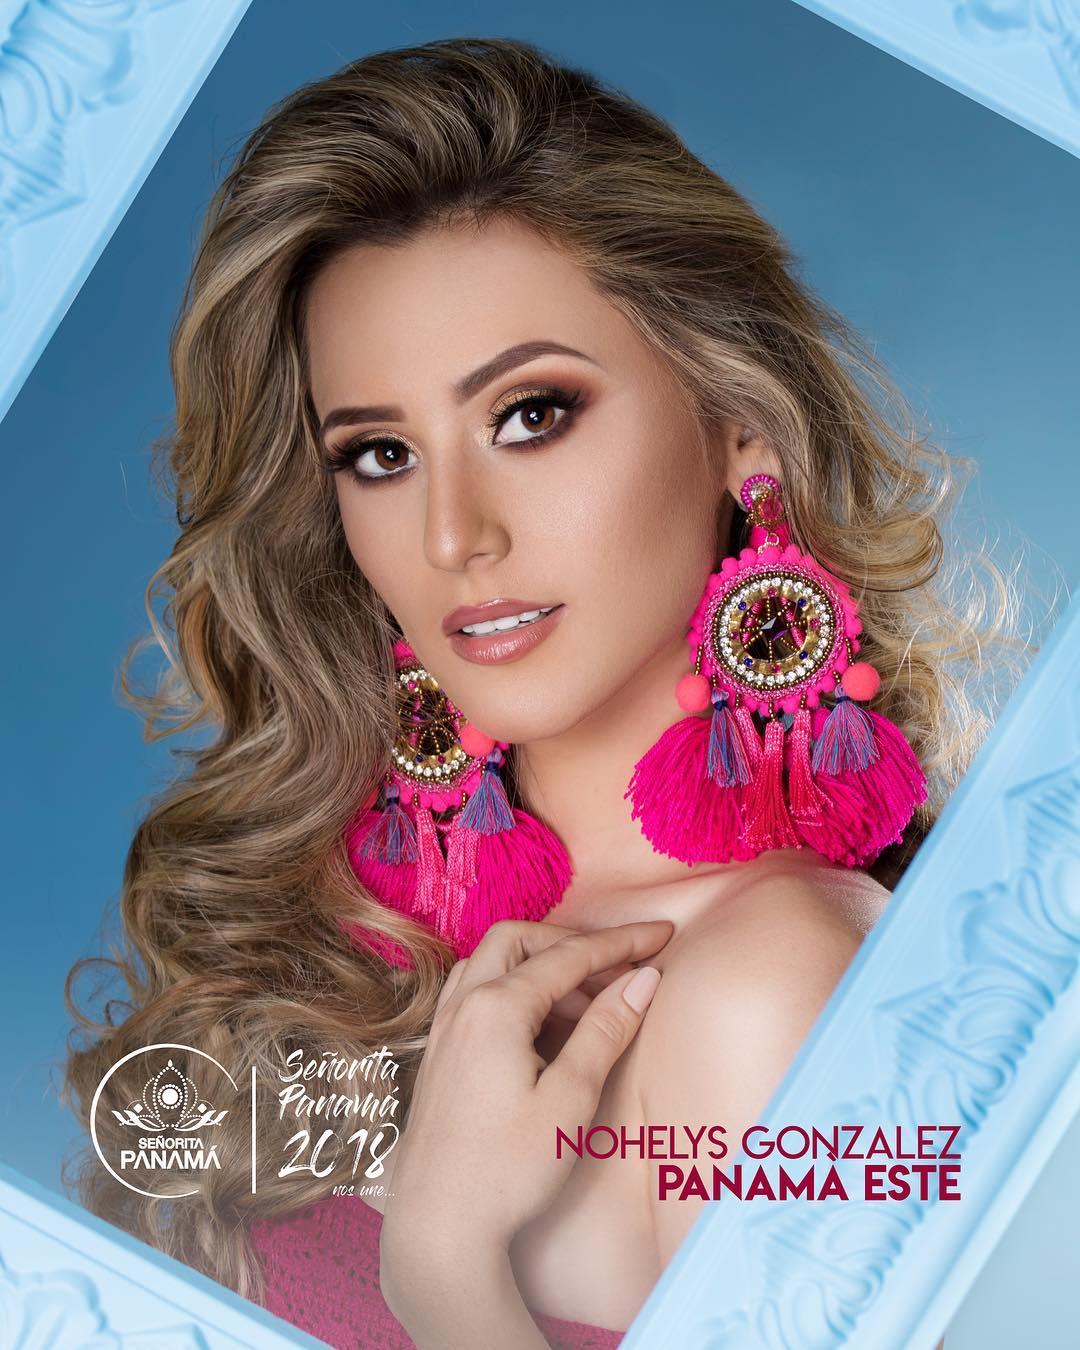 señorita miss colombia 2018 candidates candidatas contestants delegates Miss Panamá Este Nohelys González